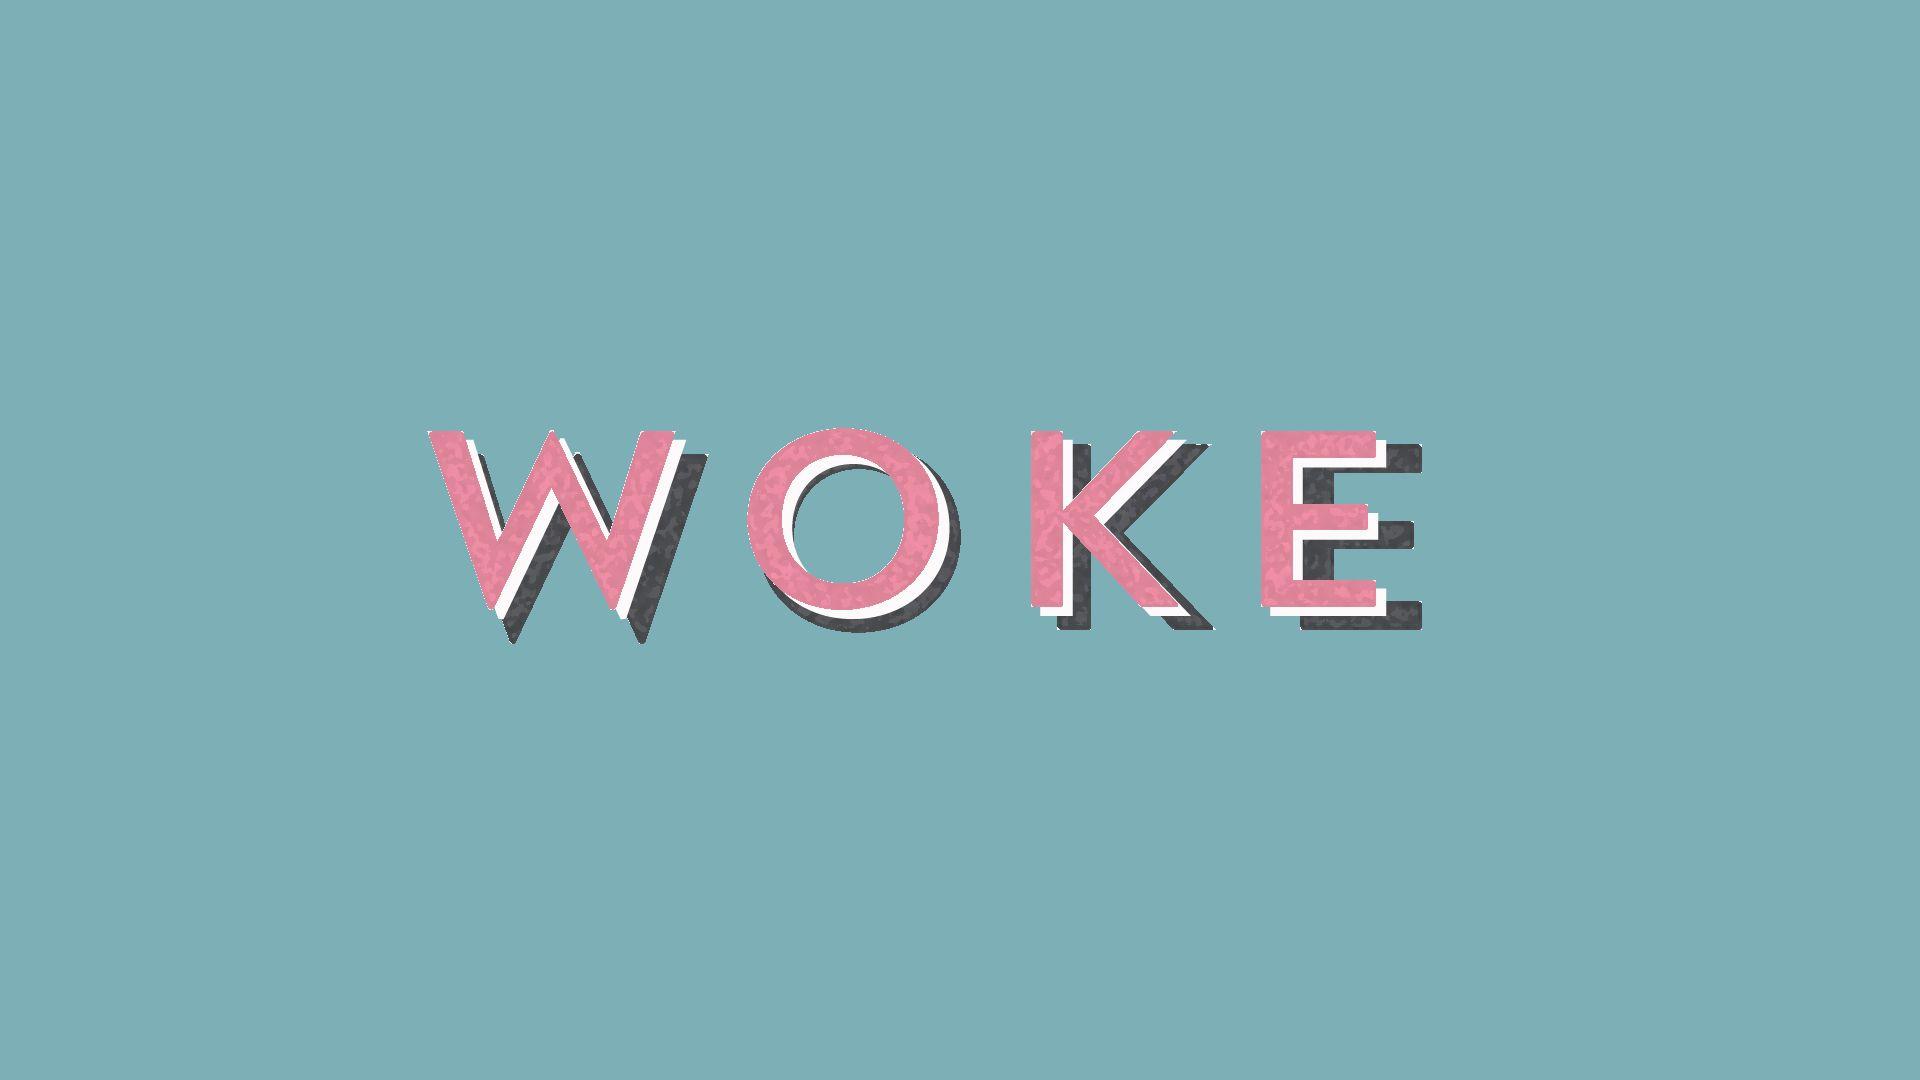 Are Christians Woke